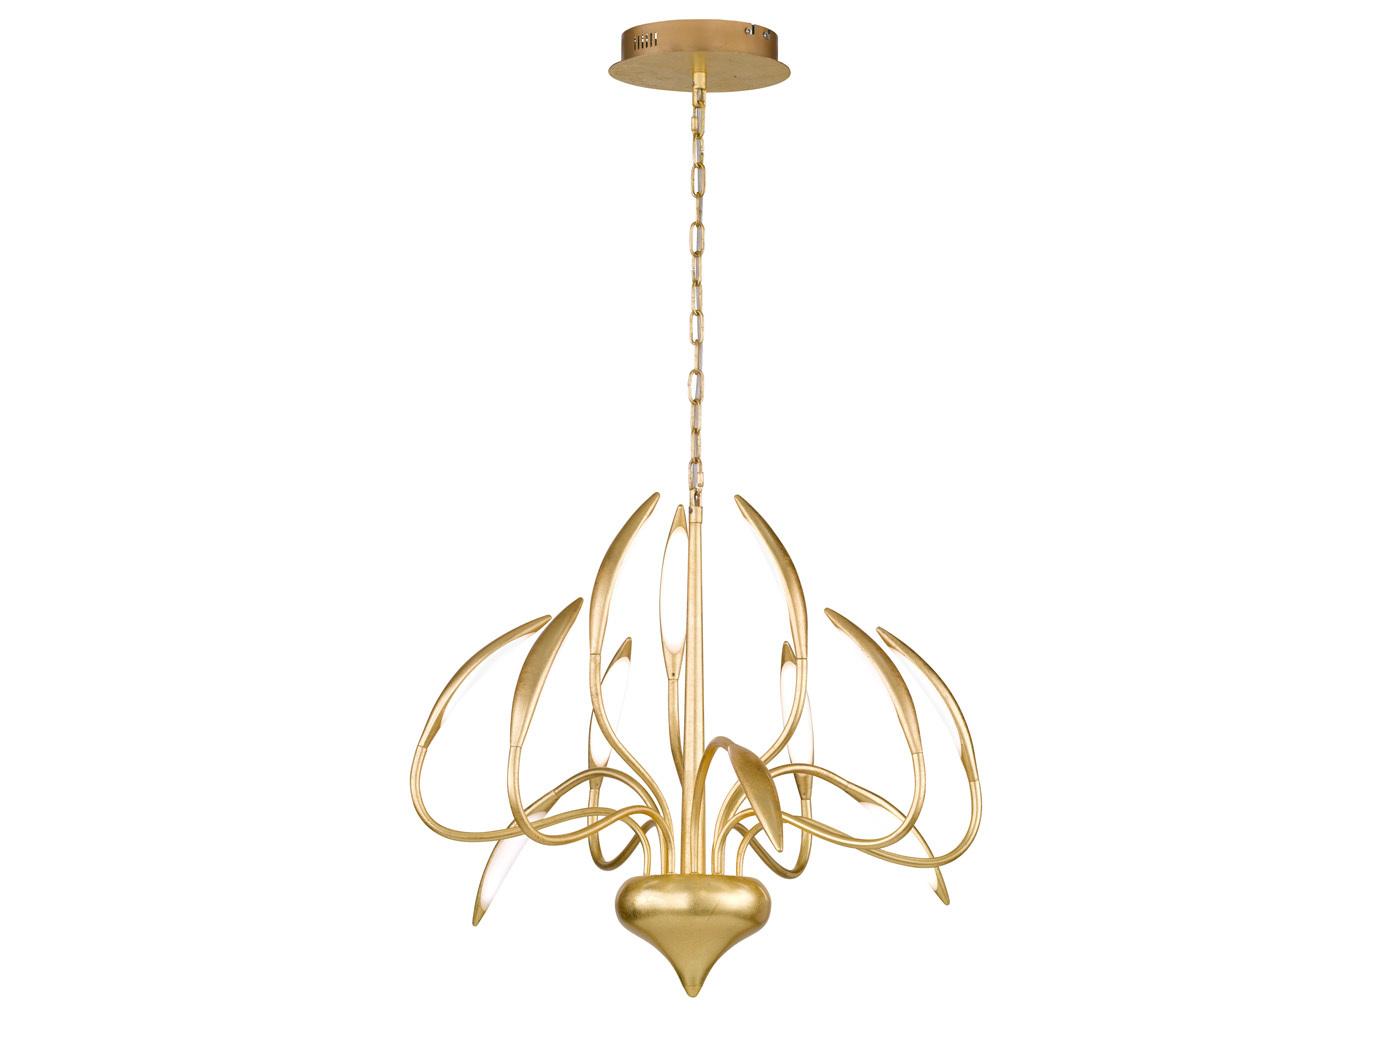 Kronleuchter Modern Mit Schirm ~ Dimmbare led pendelleuchte goldfarbig kronleuchter modern esstisch